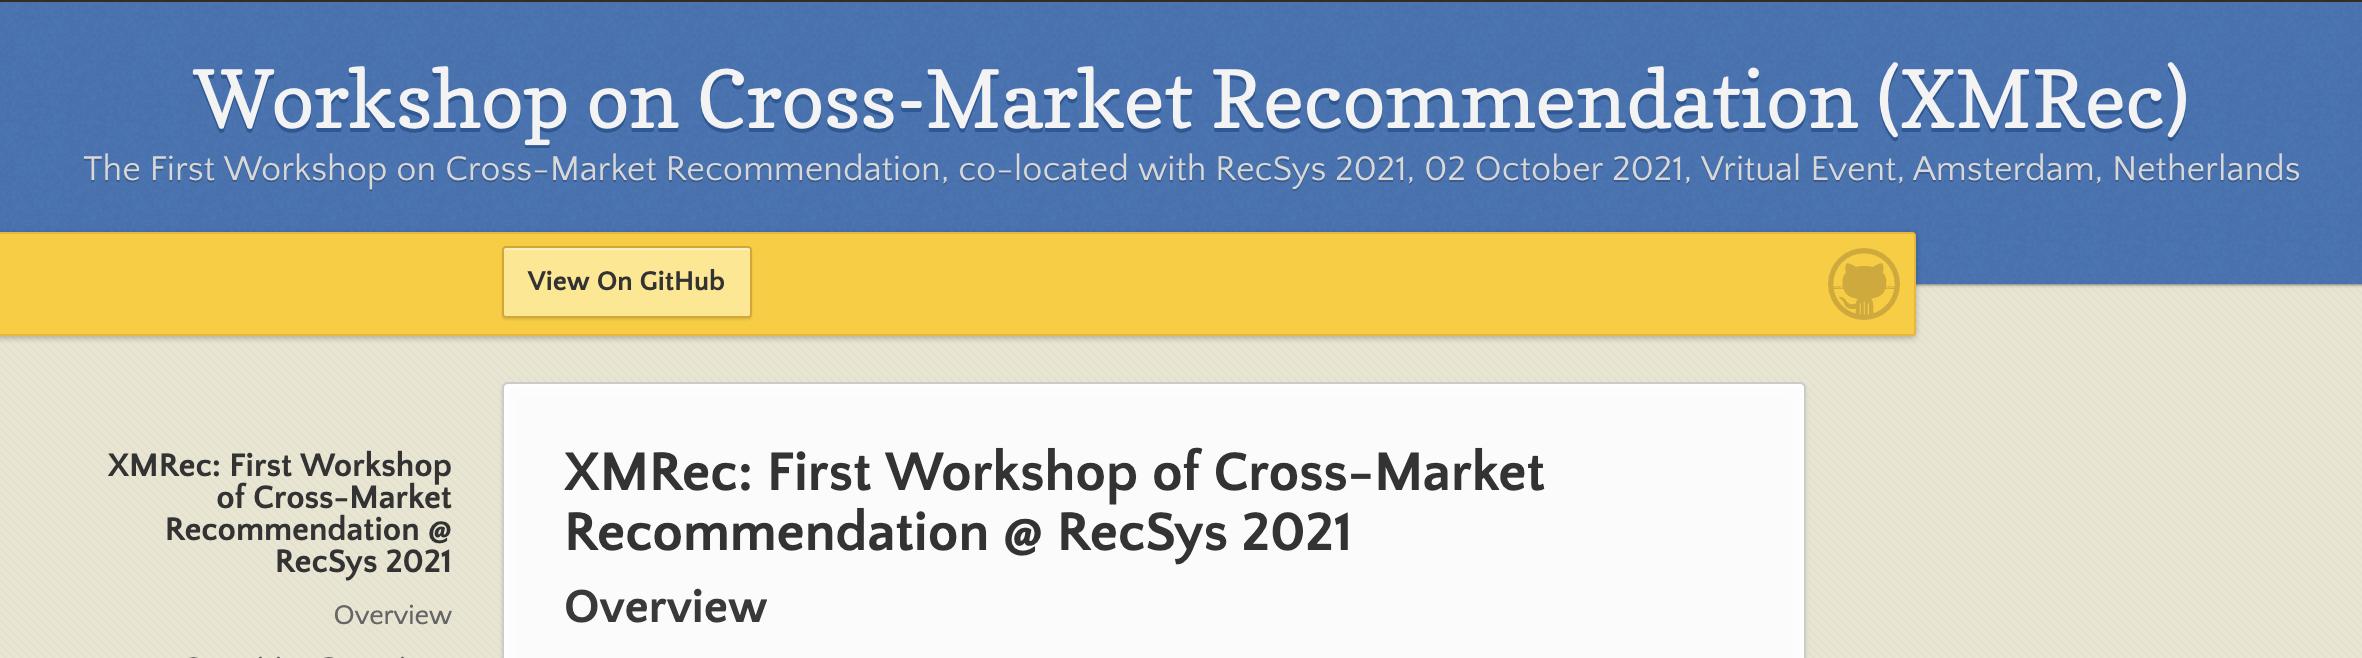 RecSys'21 Workshop on Cross-Market Recommendation (XMRec)